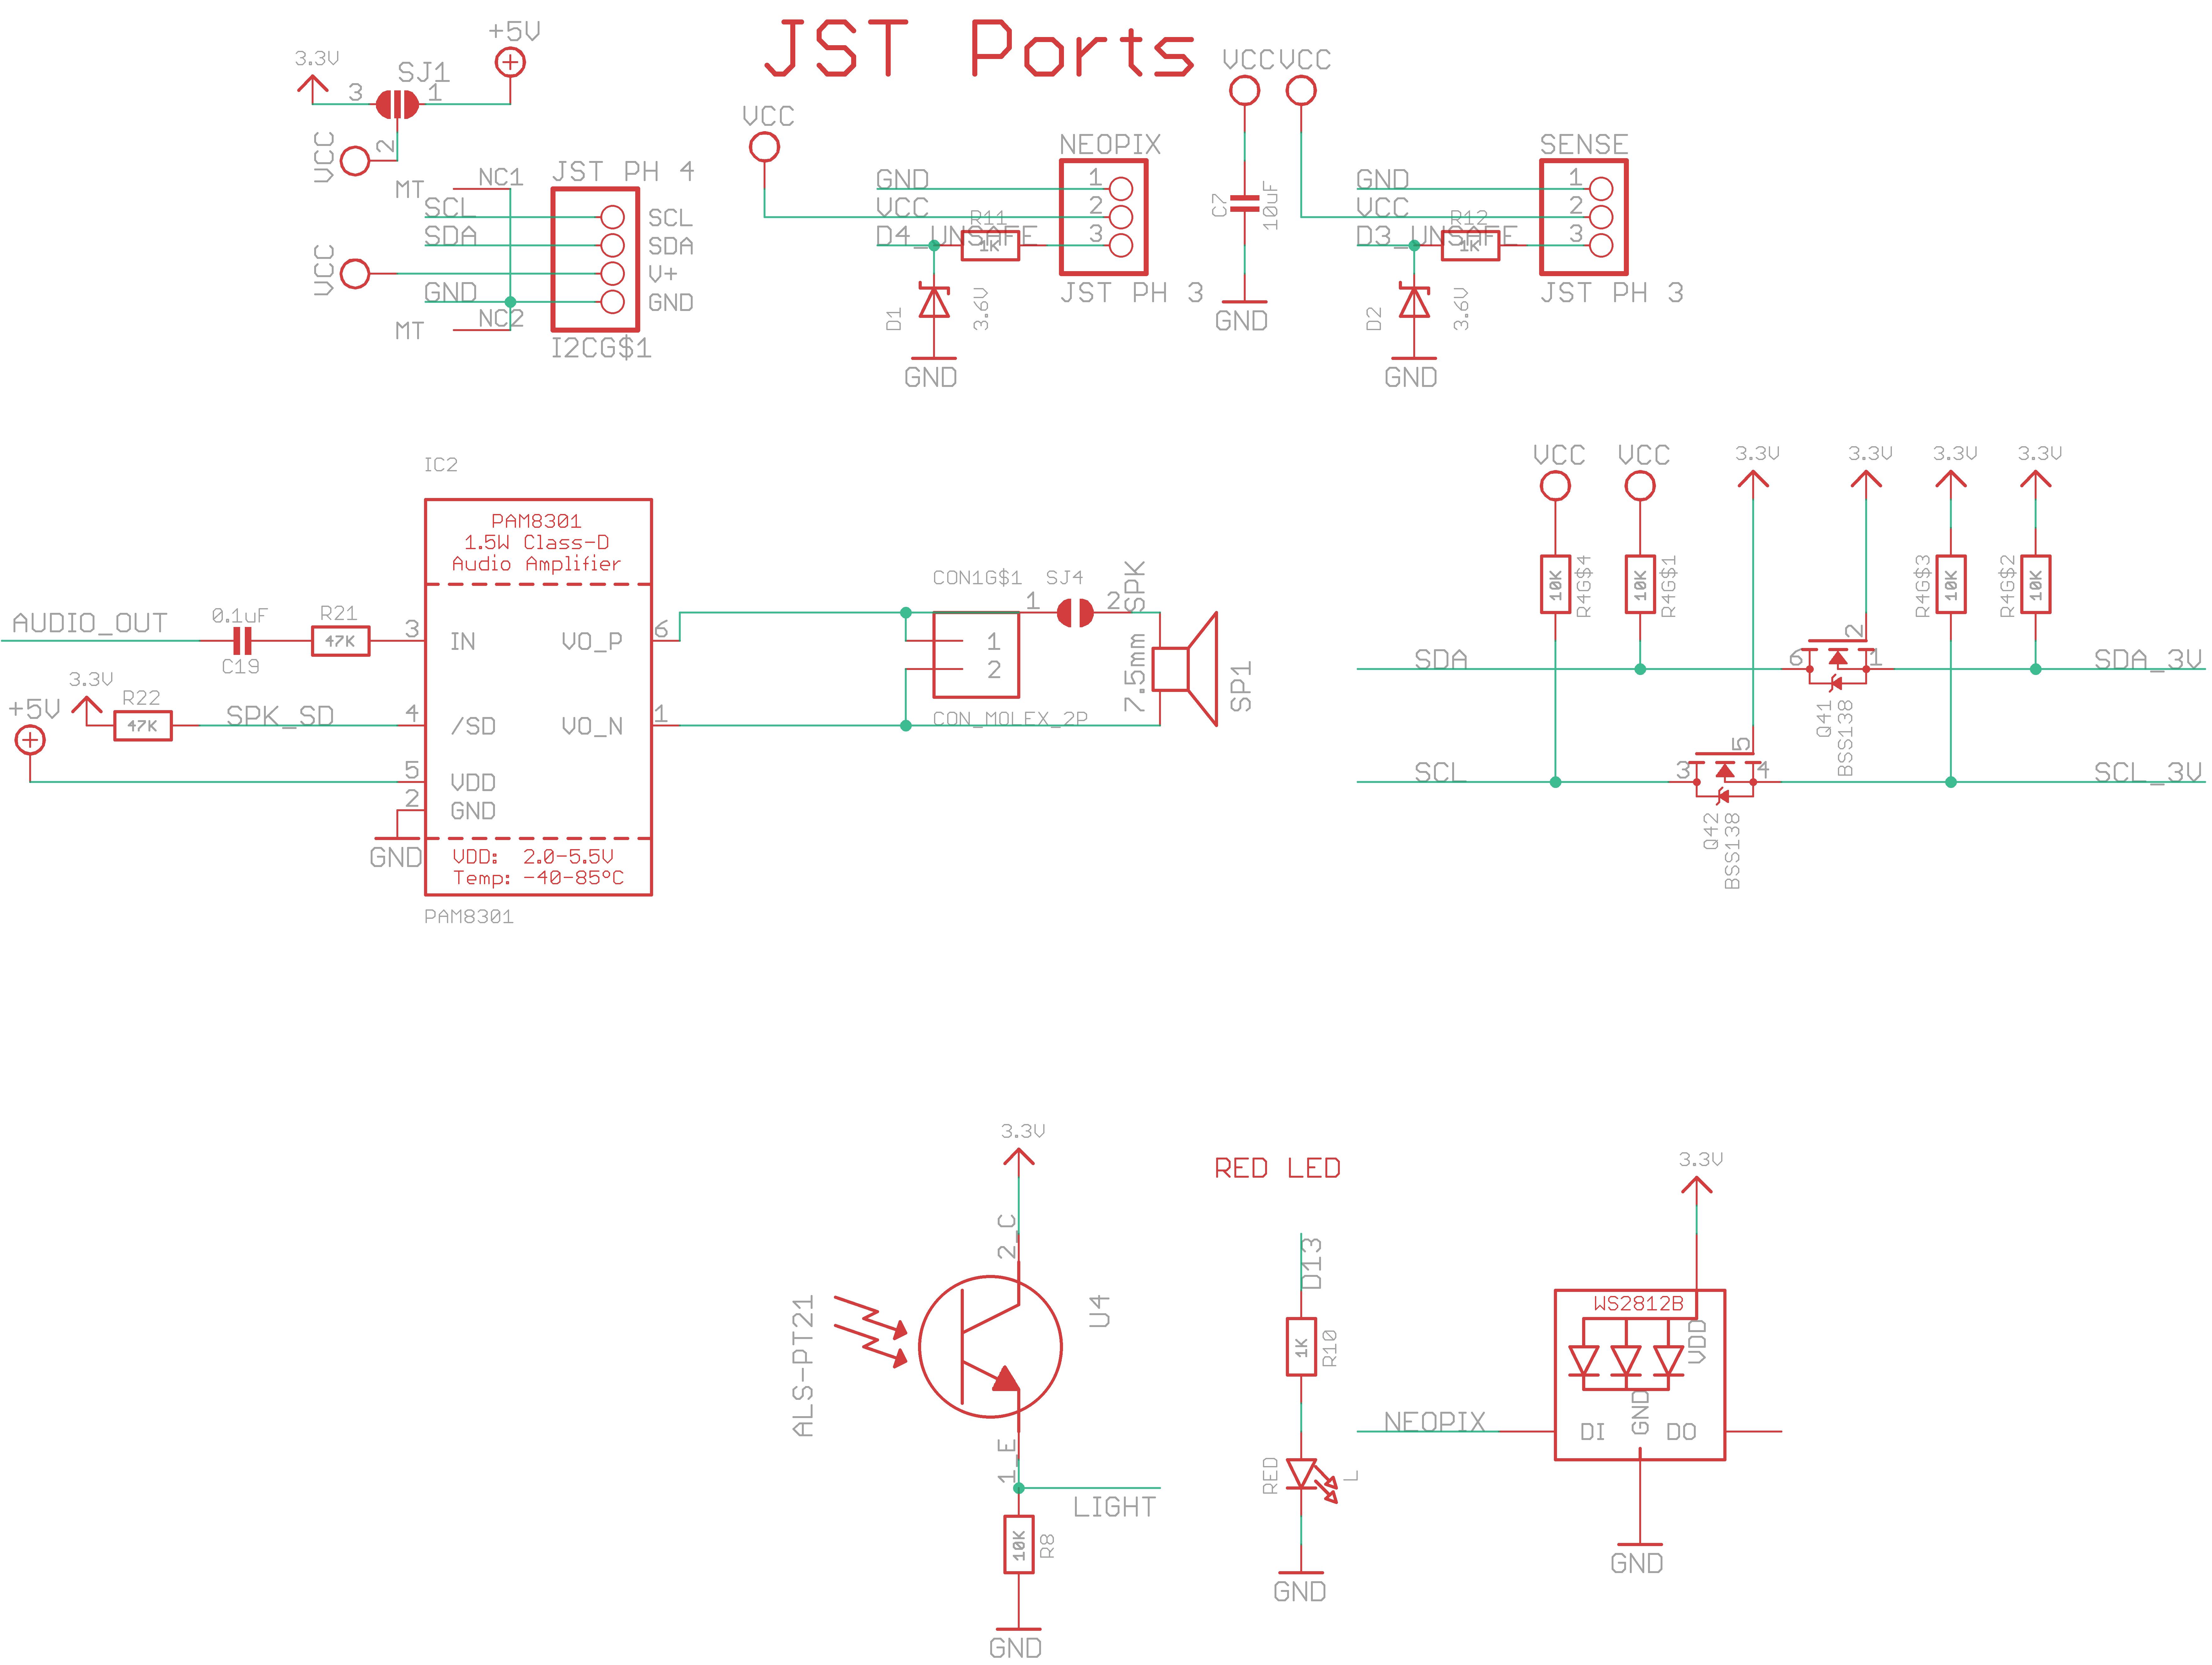 circuitpython_PyPortal_Pynt_Sch_p3.png